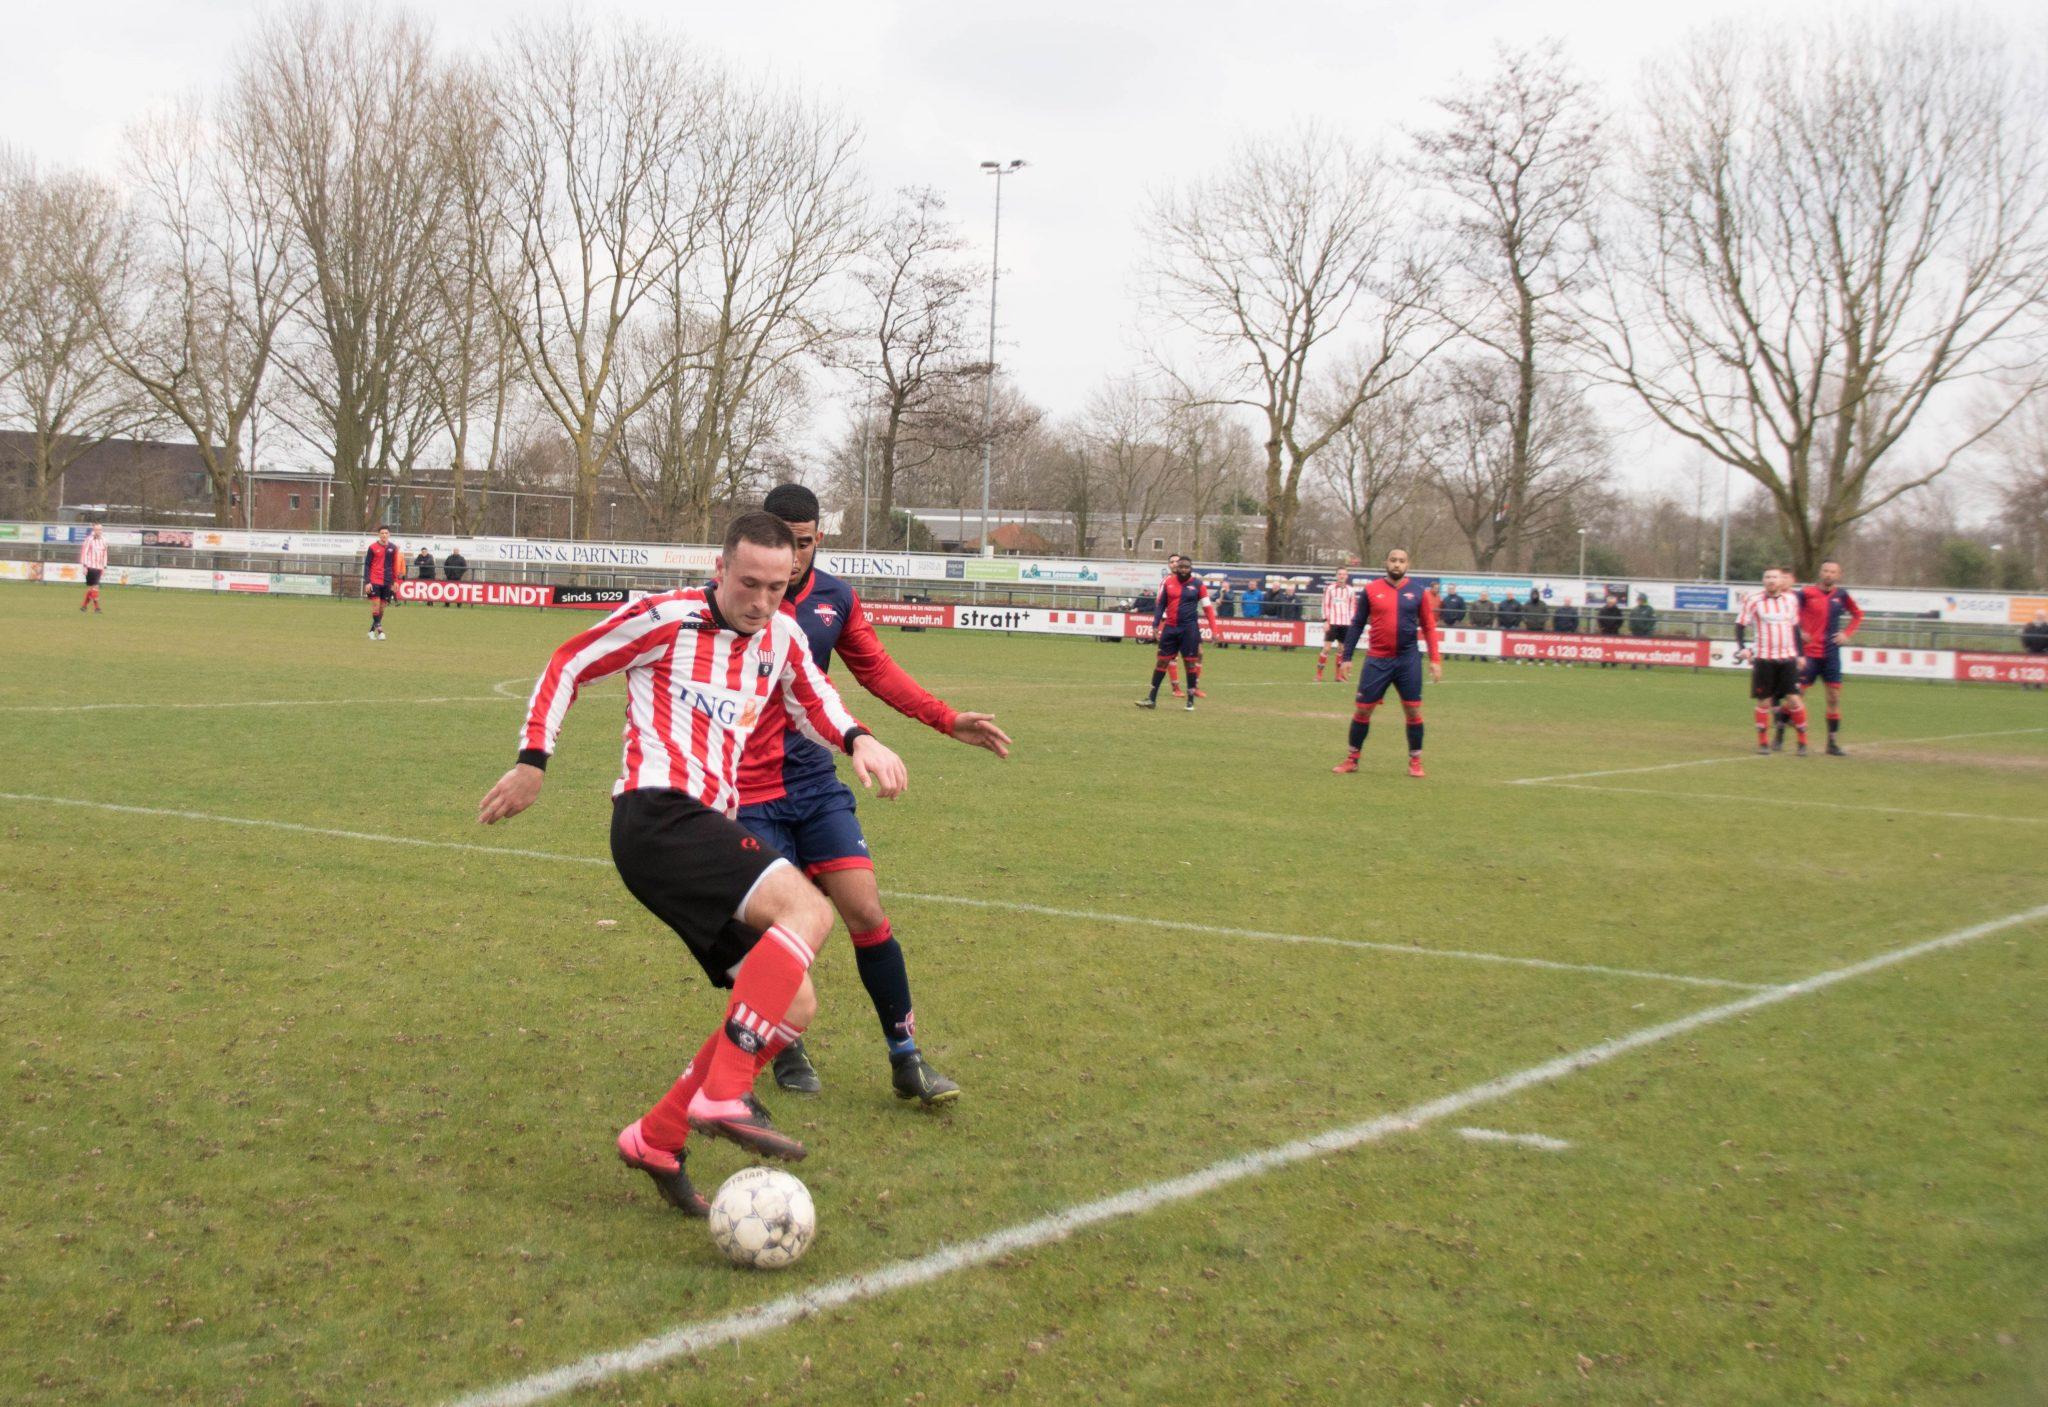 FC IJsselmonde biedt Groote Lindt weinig weerstand